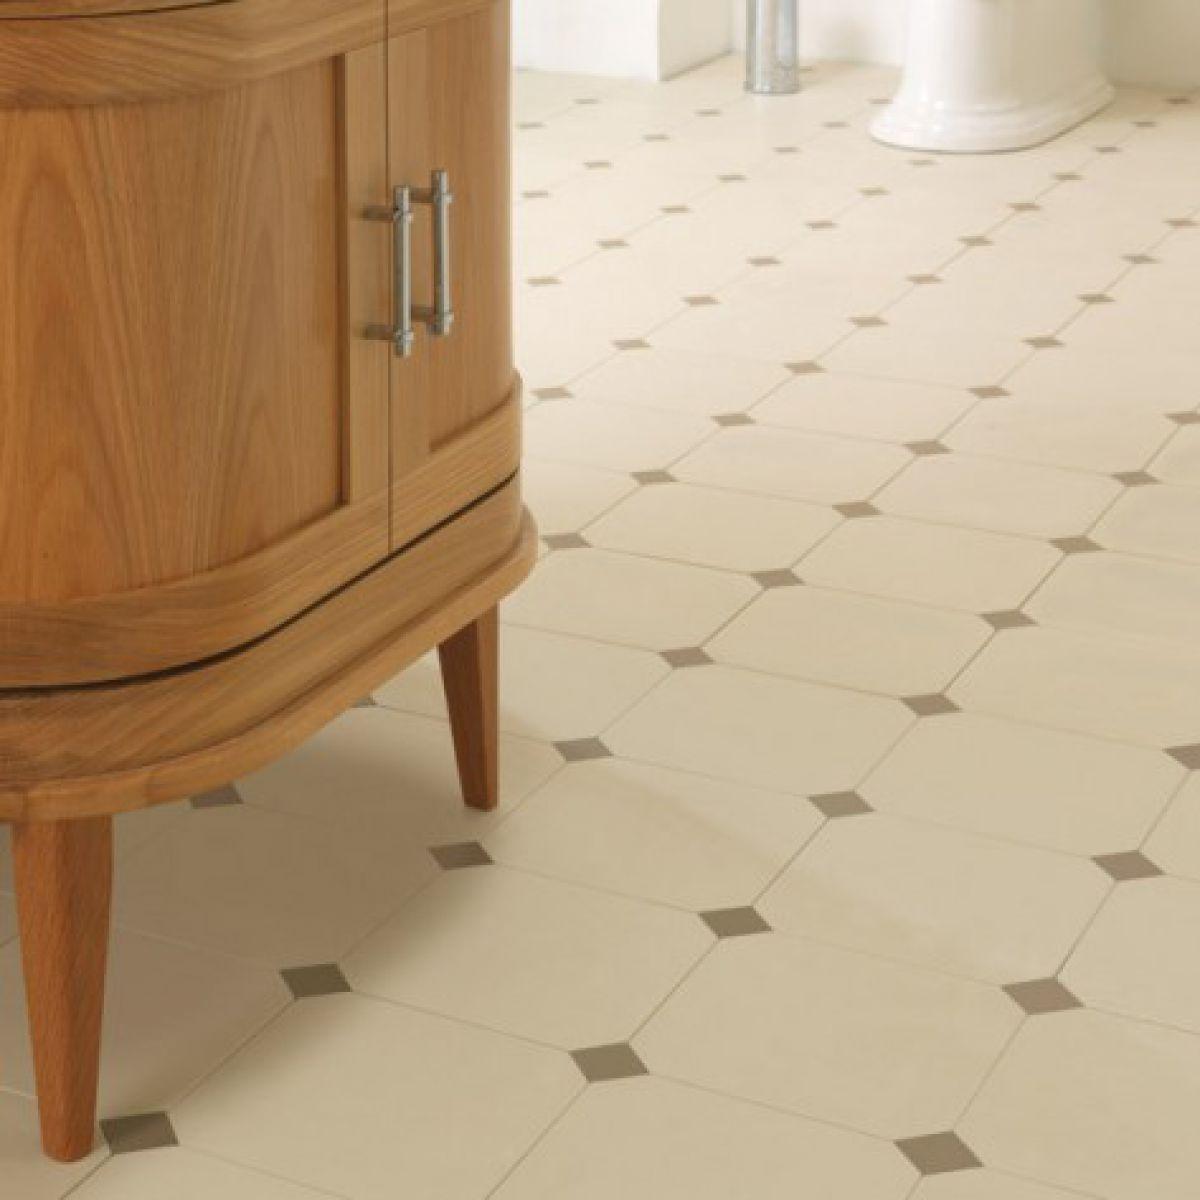 Imperial Elizabethan Octagonal Floor Tiles 20 X 20cm UK